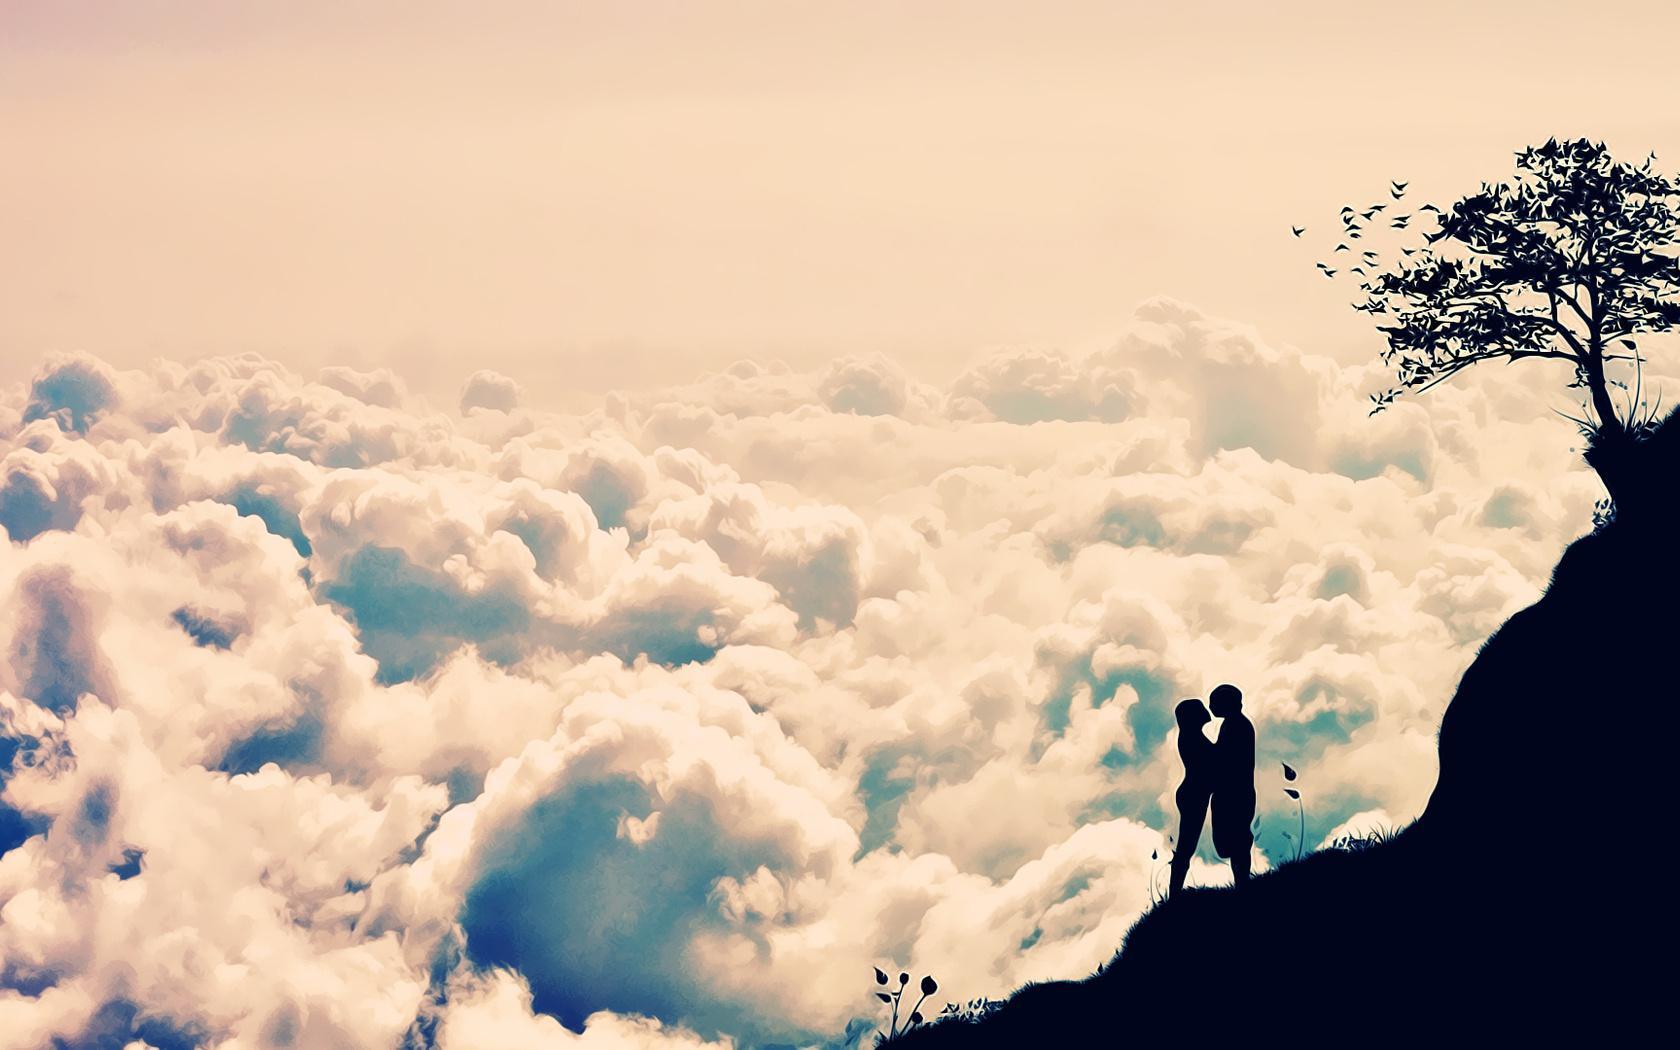 Hd wallpaper romantic - Romantic Love Hd Images Free Download Hd Wallpaper Romantic Love